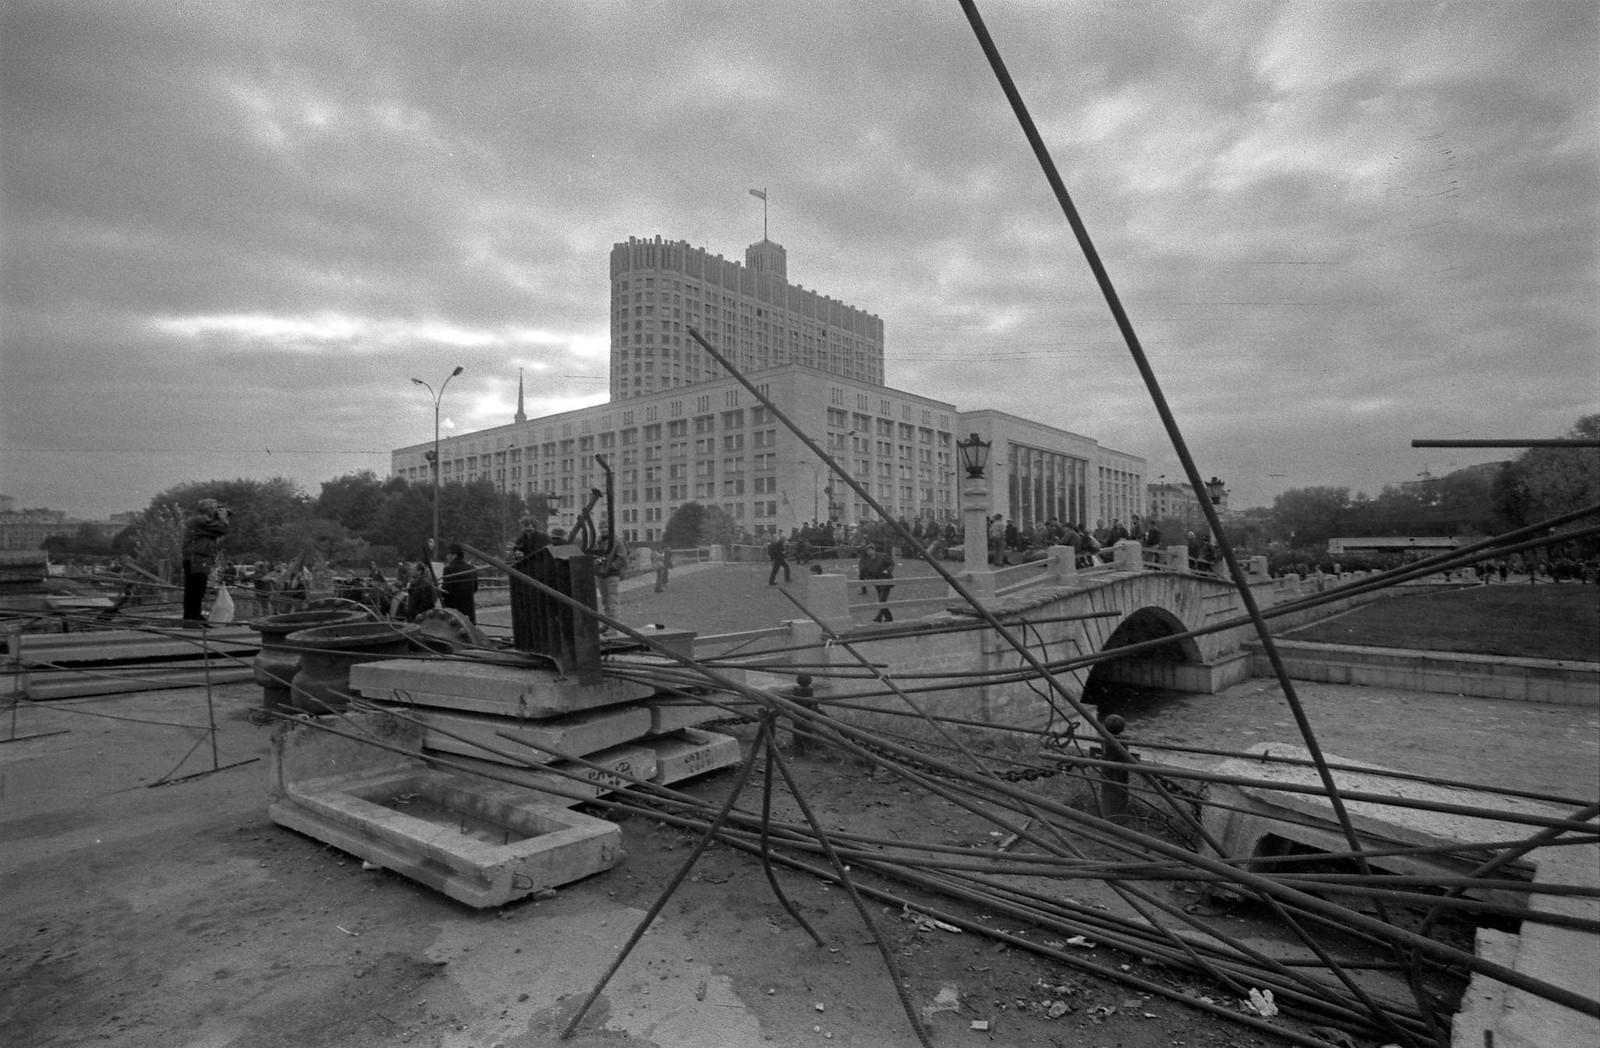 1993. Баррикады у Белого дома, октябрь  (2)